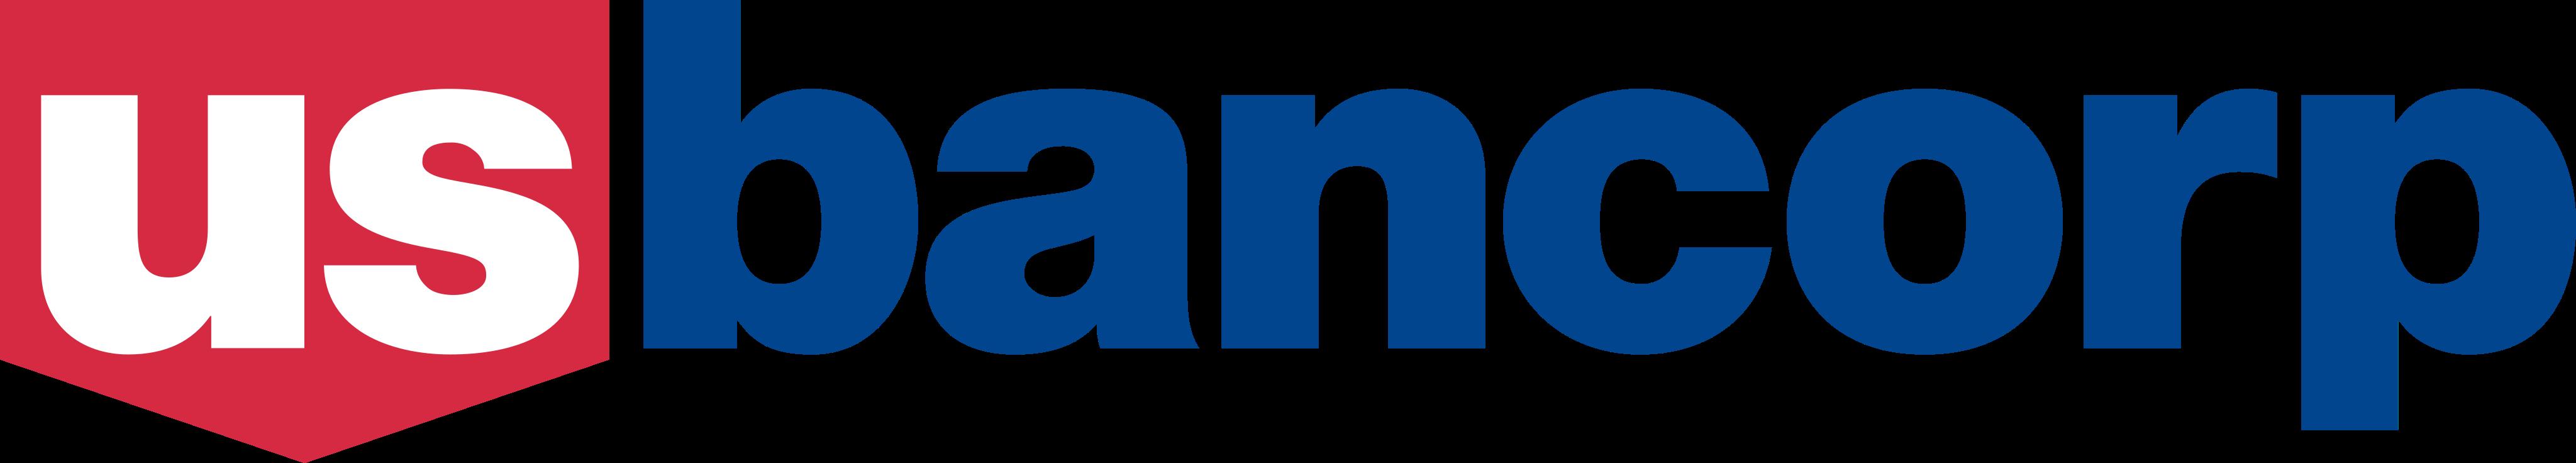 U.S. Bancorp Logo.